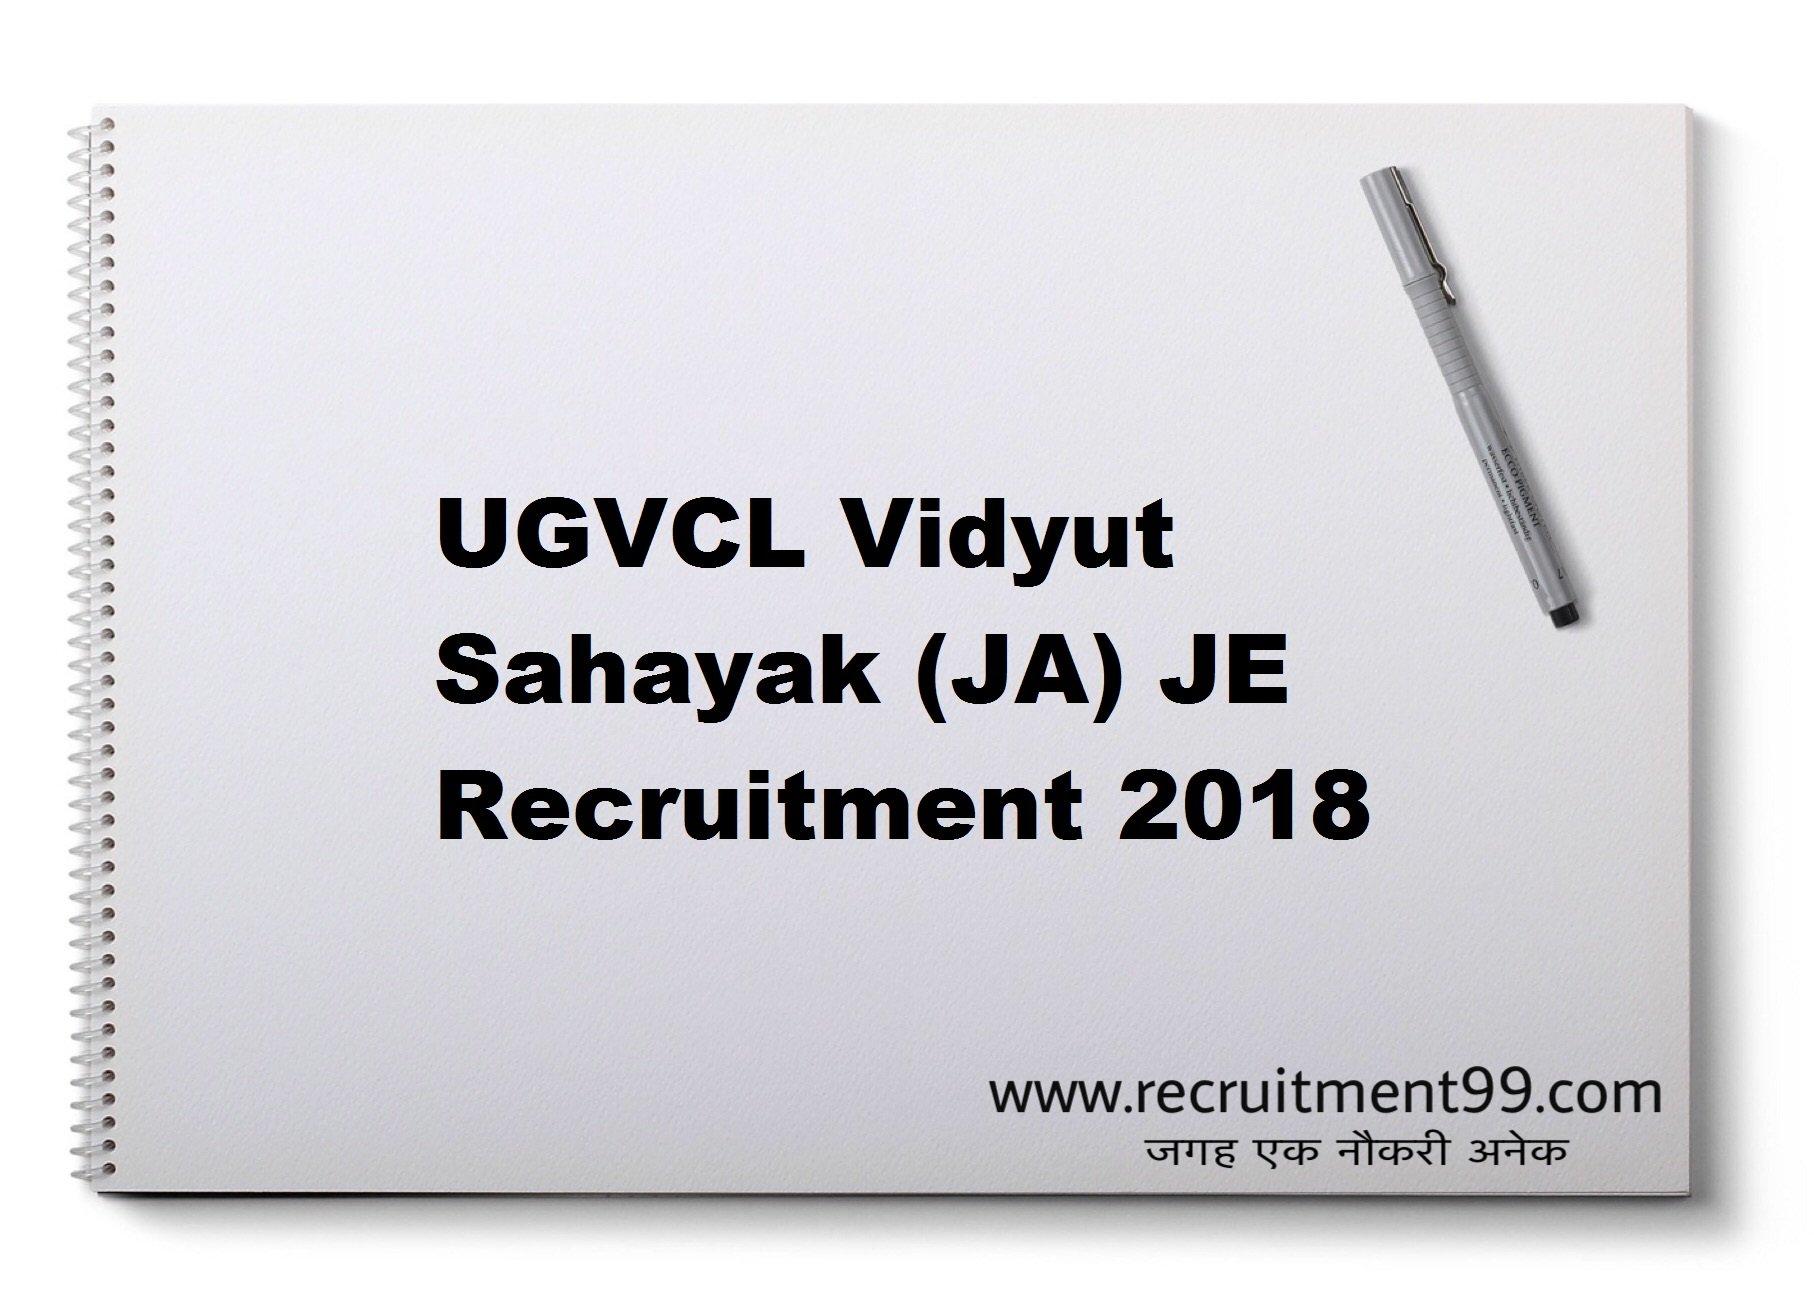 UGVCL Vidyut Sahayak (JA) JE Recruitment Admit Card Result 2018